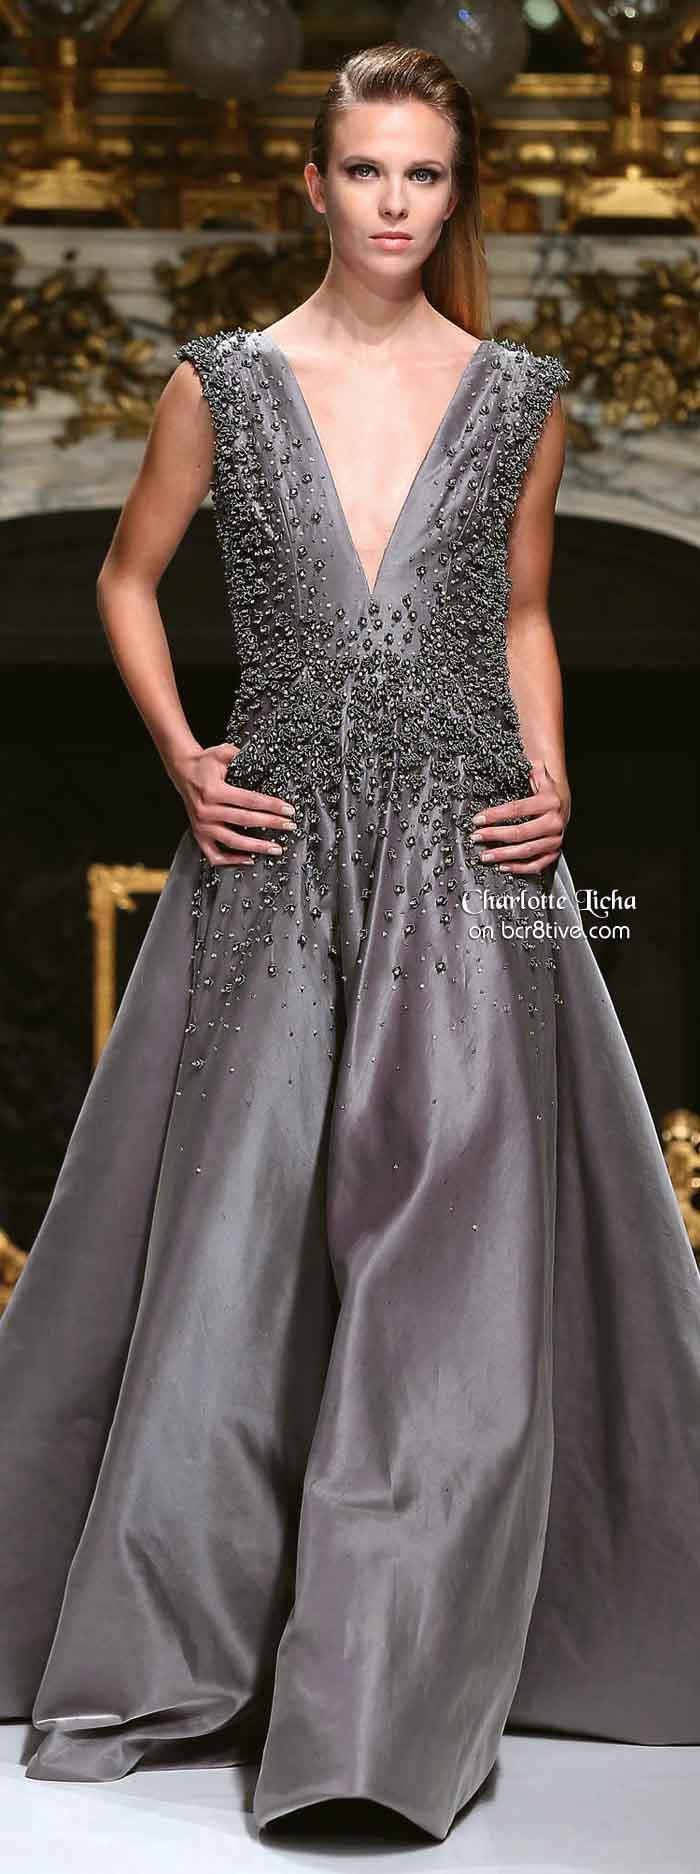 Charlotte Licha Spring 2014 Couture